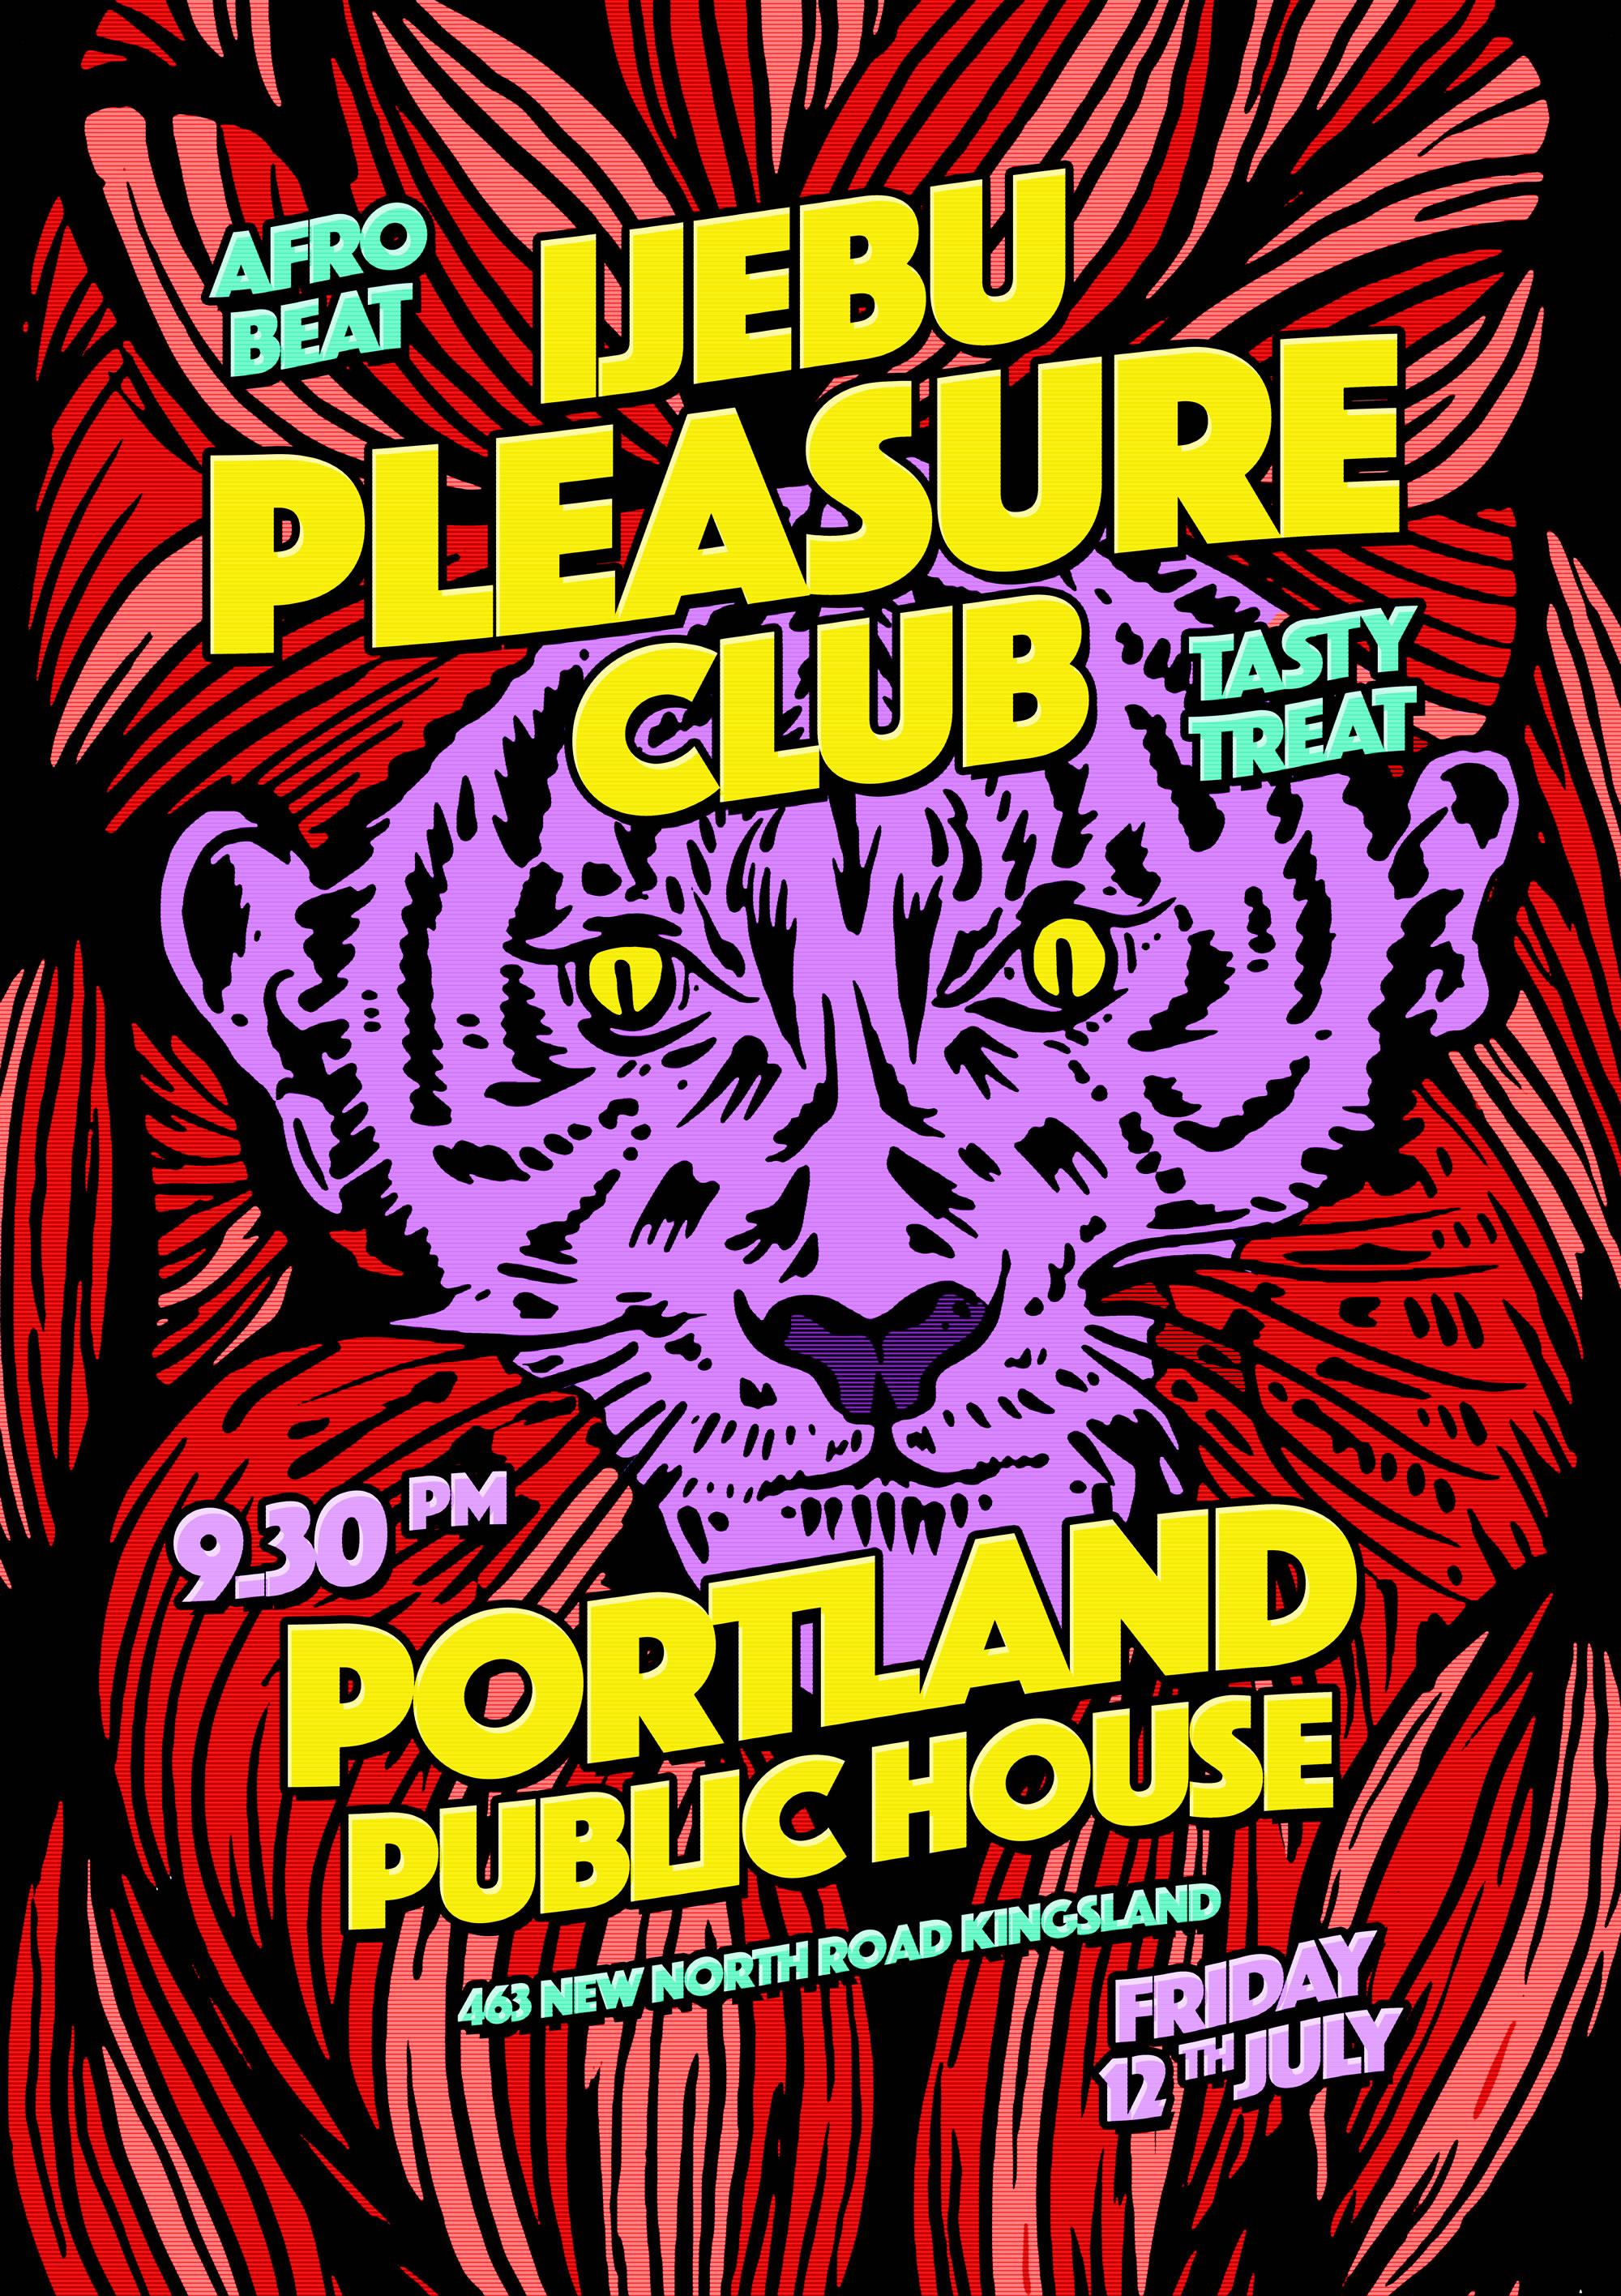 poster Jul 12 - PORTLAND - web.jpg